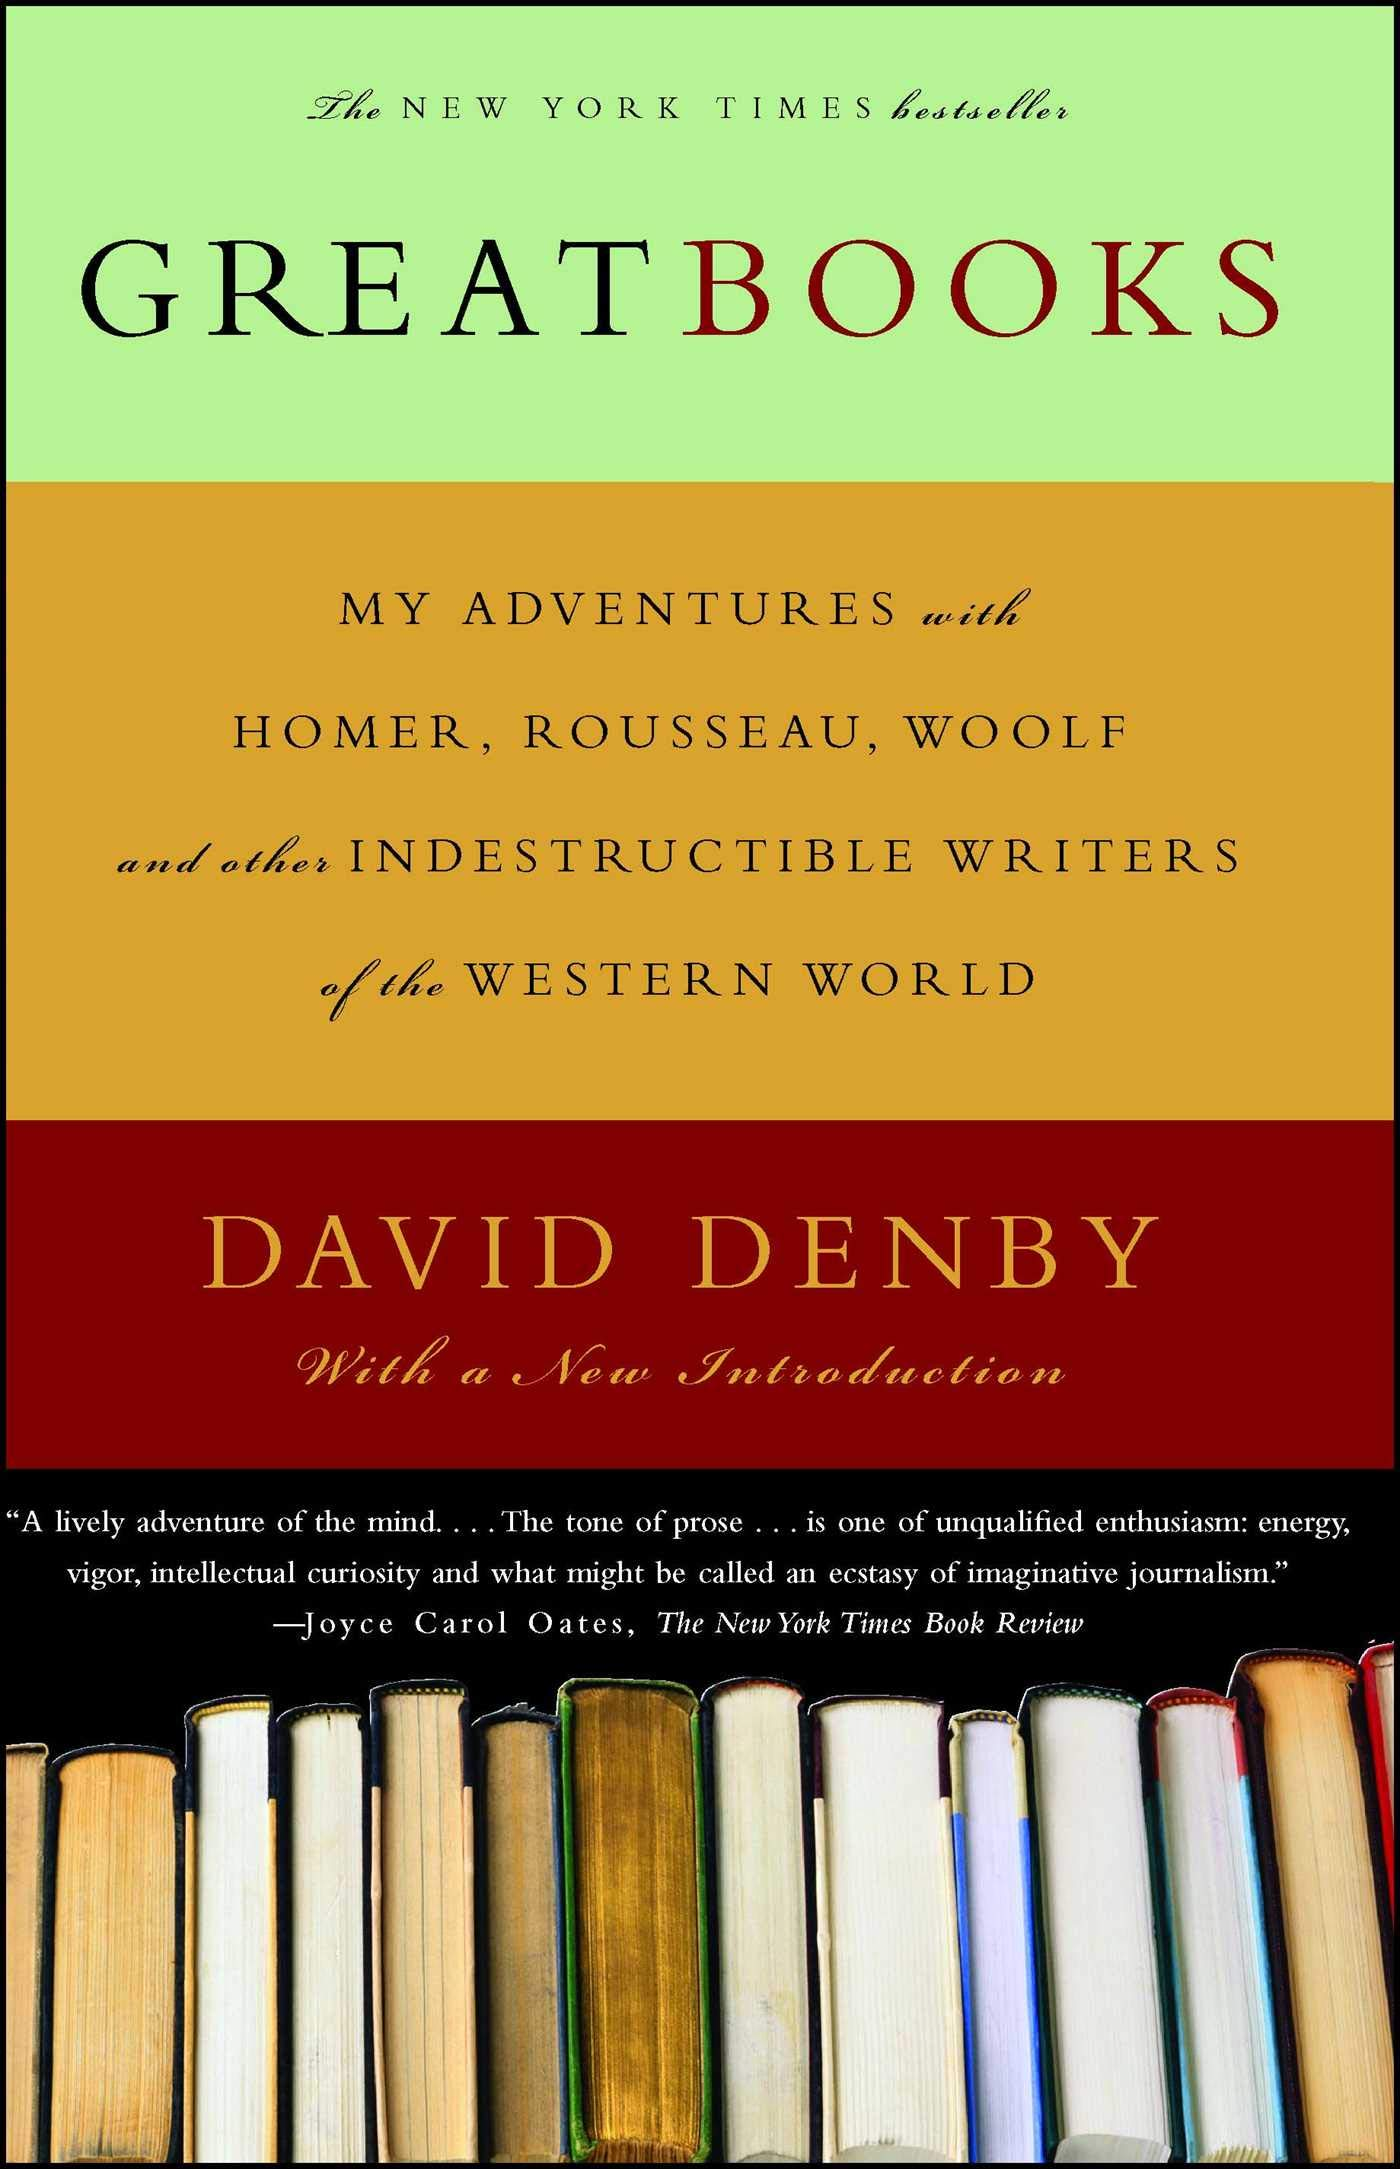 Great Books Denby David 9780684835334 Amazon Com Books